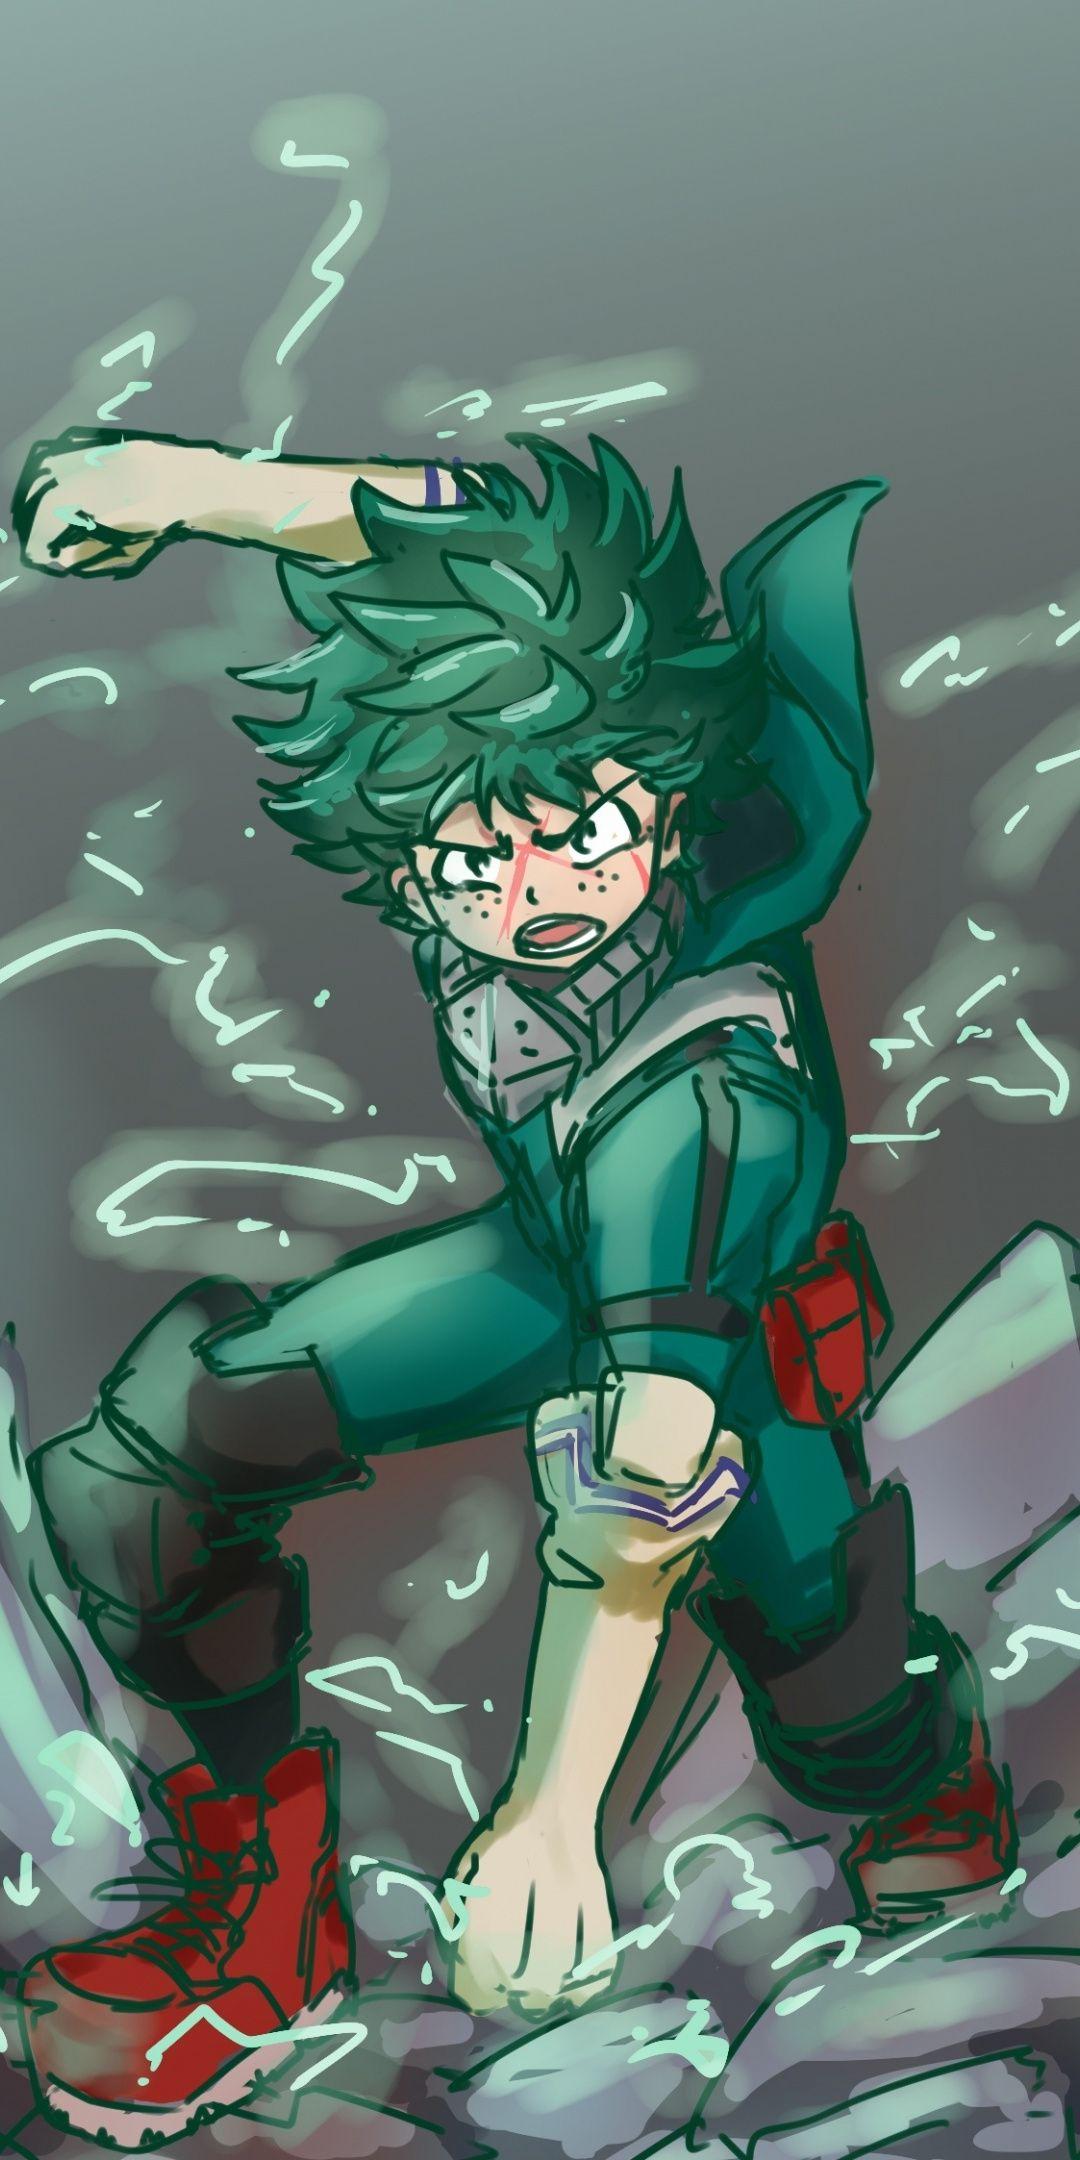 Angry Green Hair Anime Boy Izuku Midoriya 1080x2160 Wallpaper Anime Boy Anime Green Hair